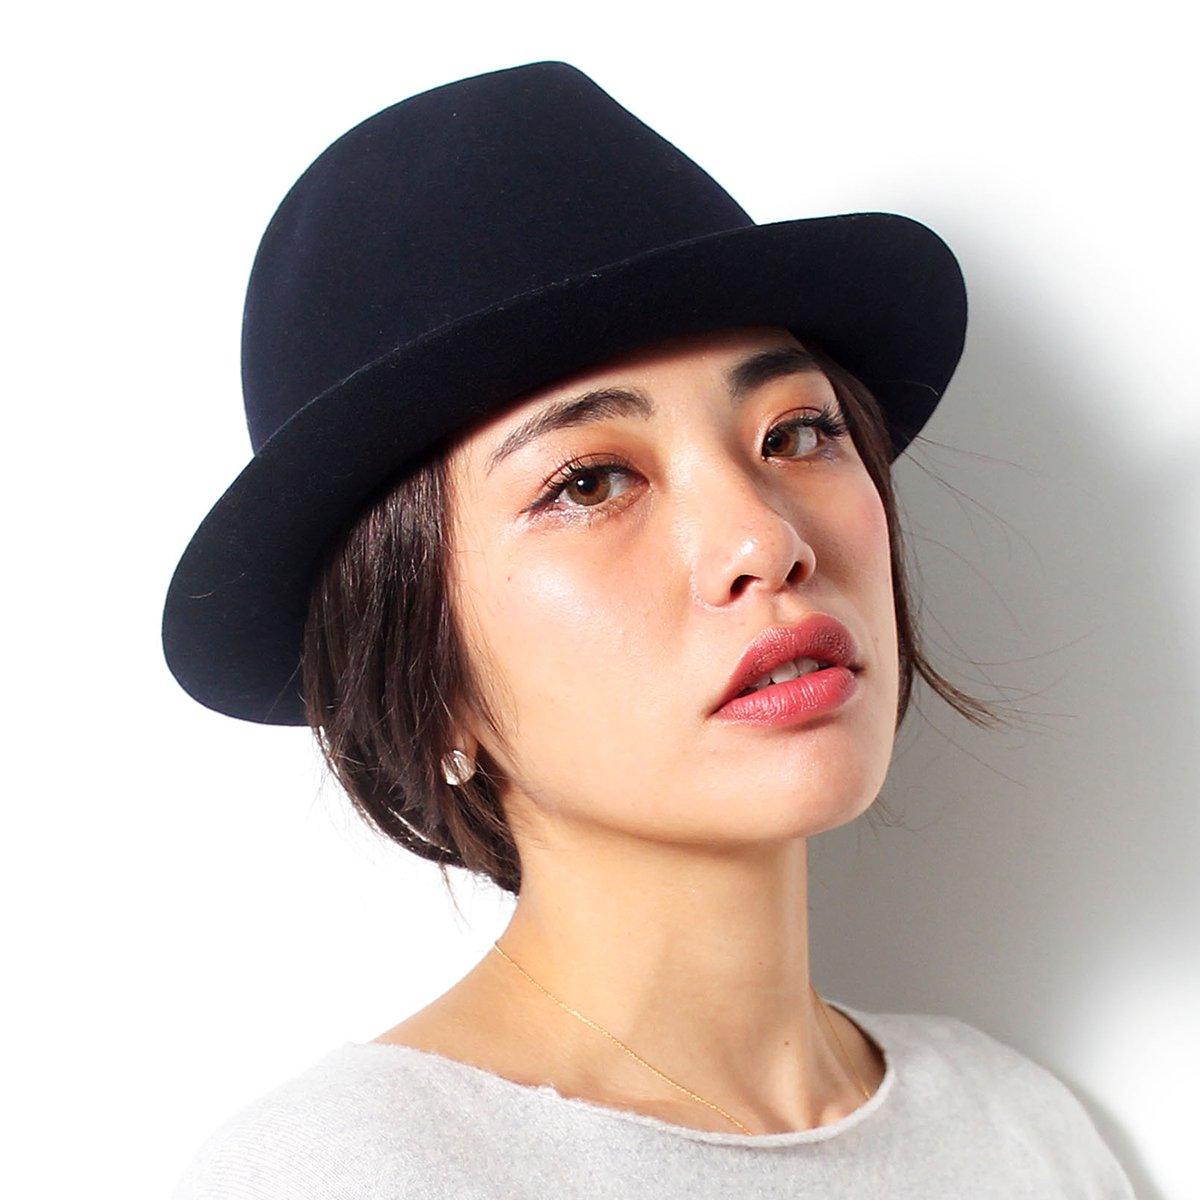 NOMAD FELT HAT SHORT 詳細画像12